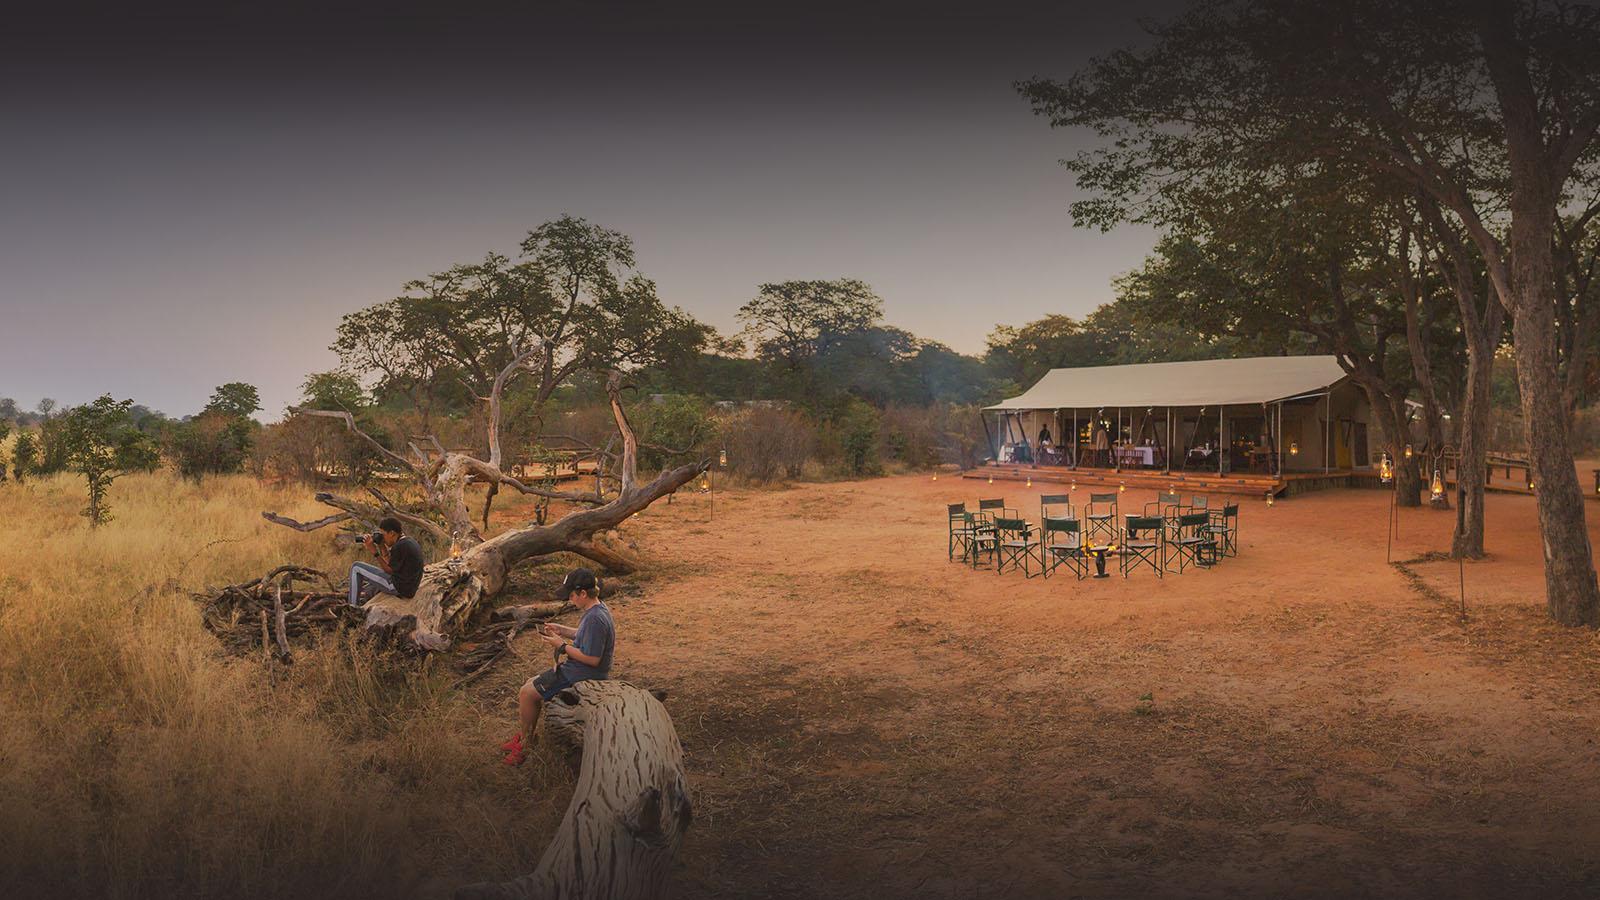 verneys machaba hwange-national-park-safari-zimbabwe-luxury-accommodation-pano